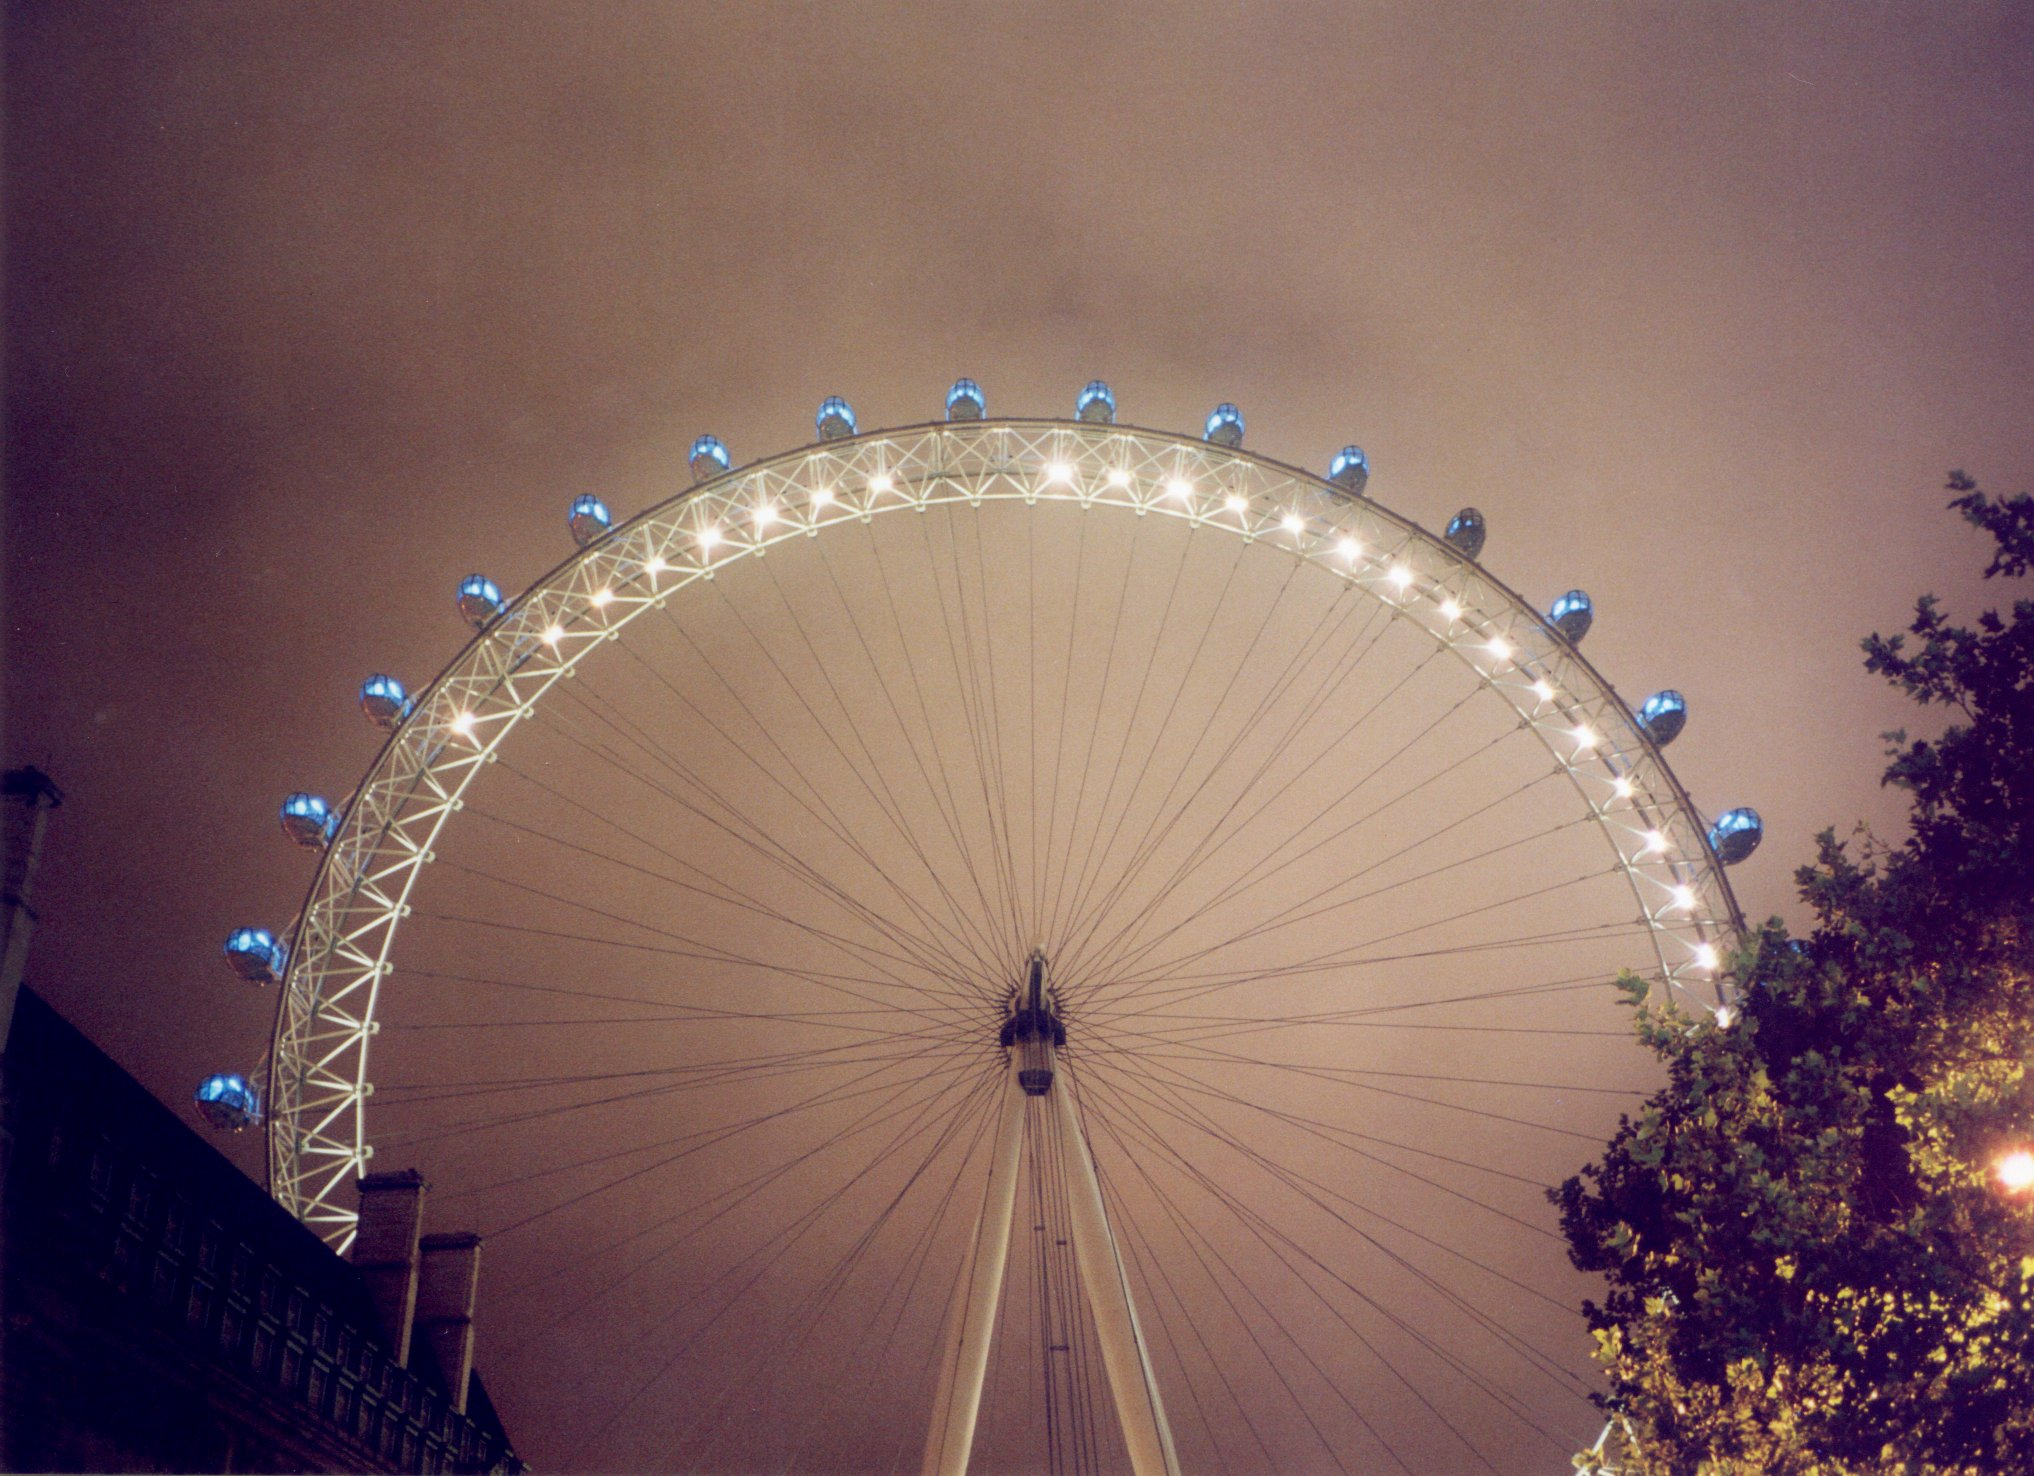 """London Eye Nacht"". Licensed under Creative Commons Attribution-Share Alike 3.0 via Wikimedia Commons - http://commons.wikimedia.org/wiki/File:London_Eye_Nacht.jpg#mediaviewer/File:London_Eye_Nacht.jpg"